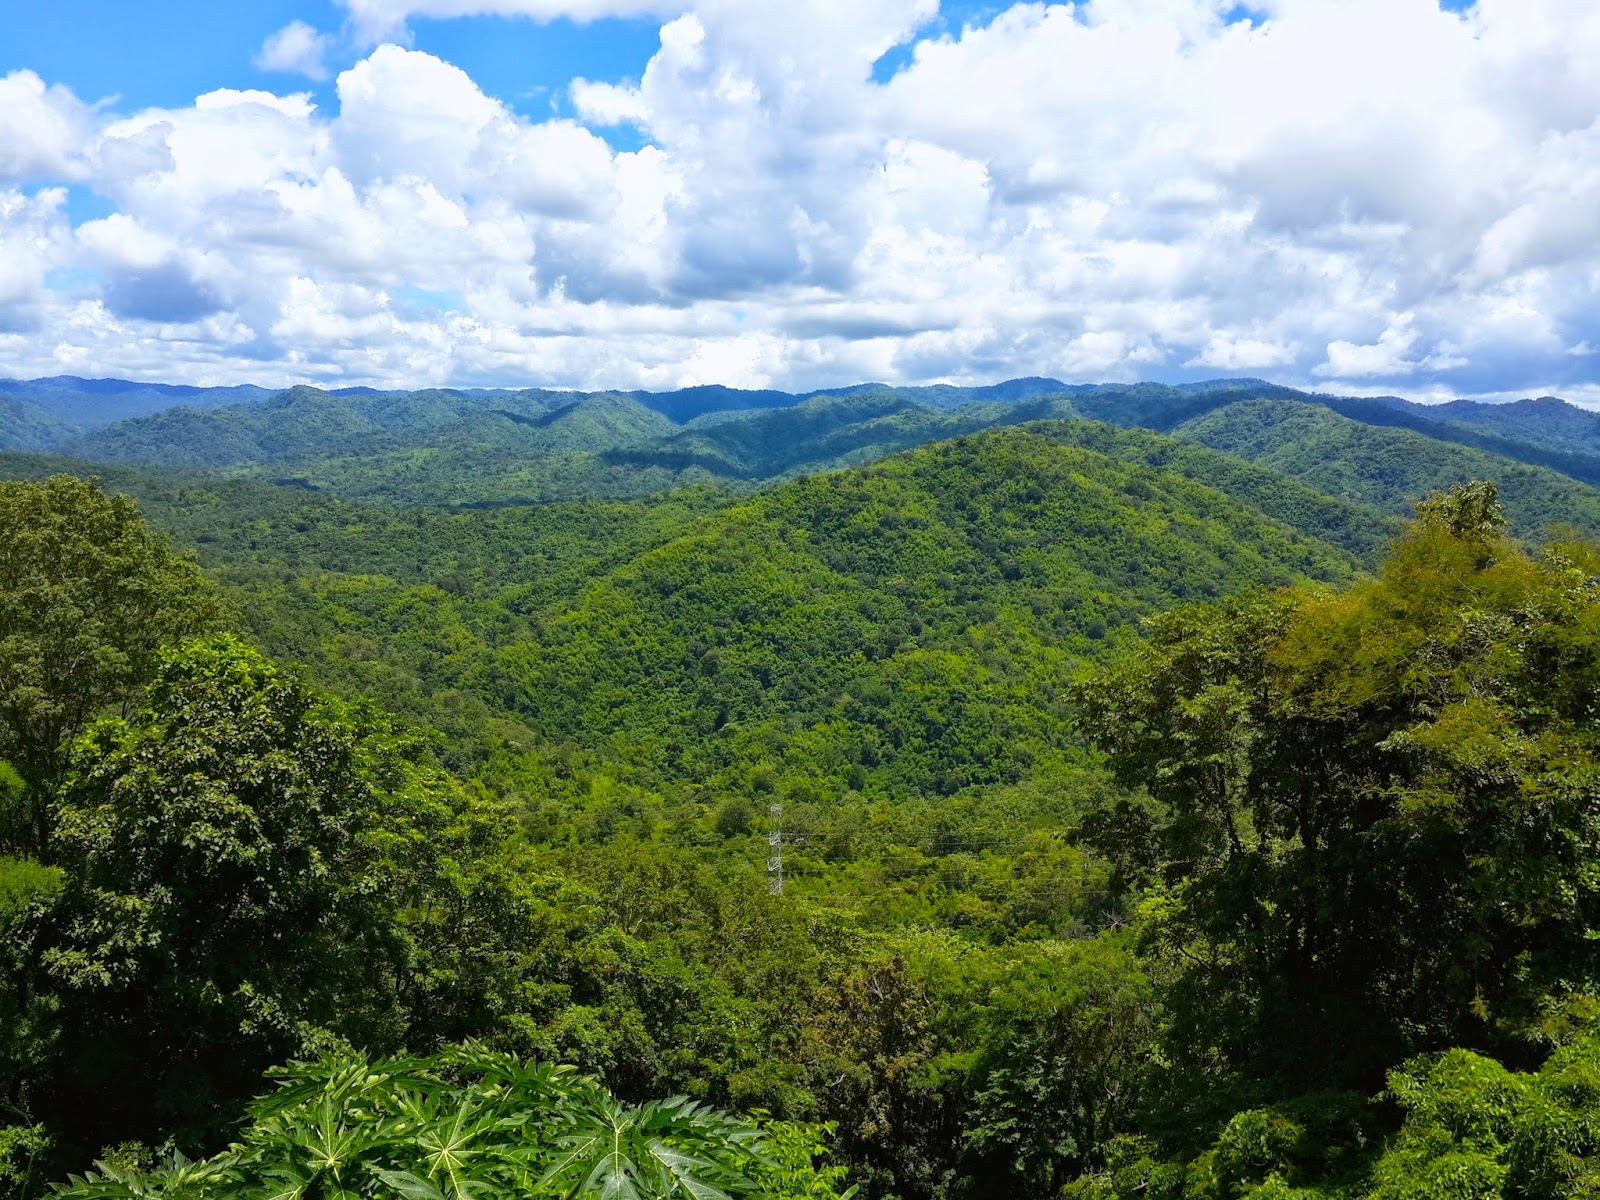 Endless green at Nam Nao National Park, Thailand